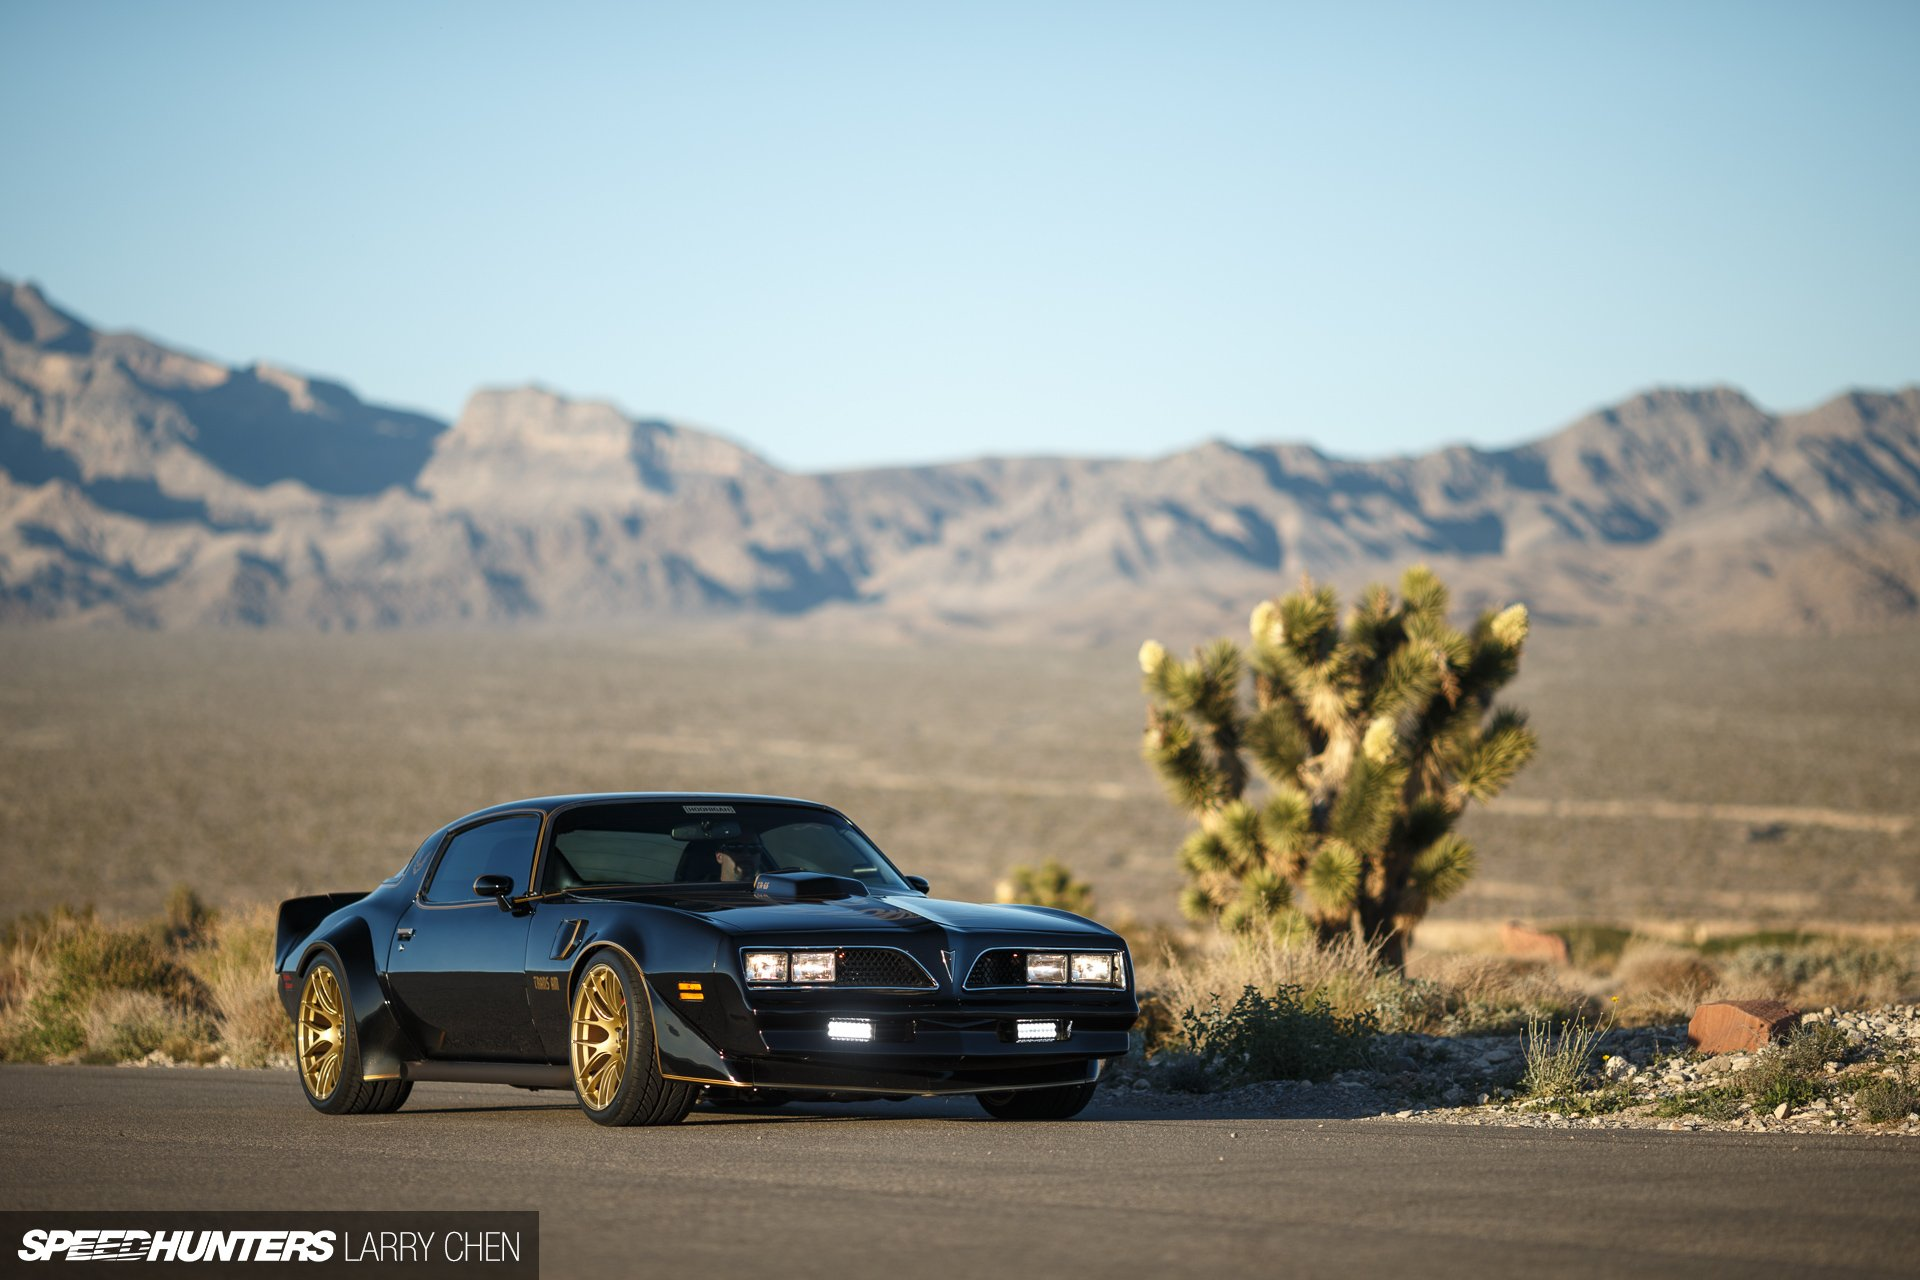 Firebird hoonigan Muscle Pontiac Trans Am turbo trans hot rod rods 1920x1280